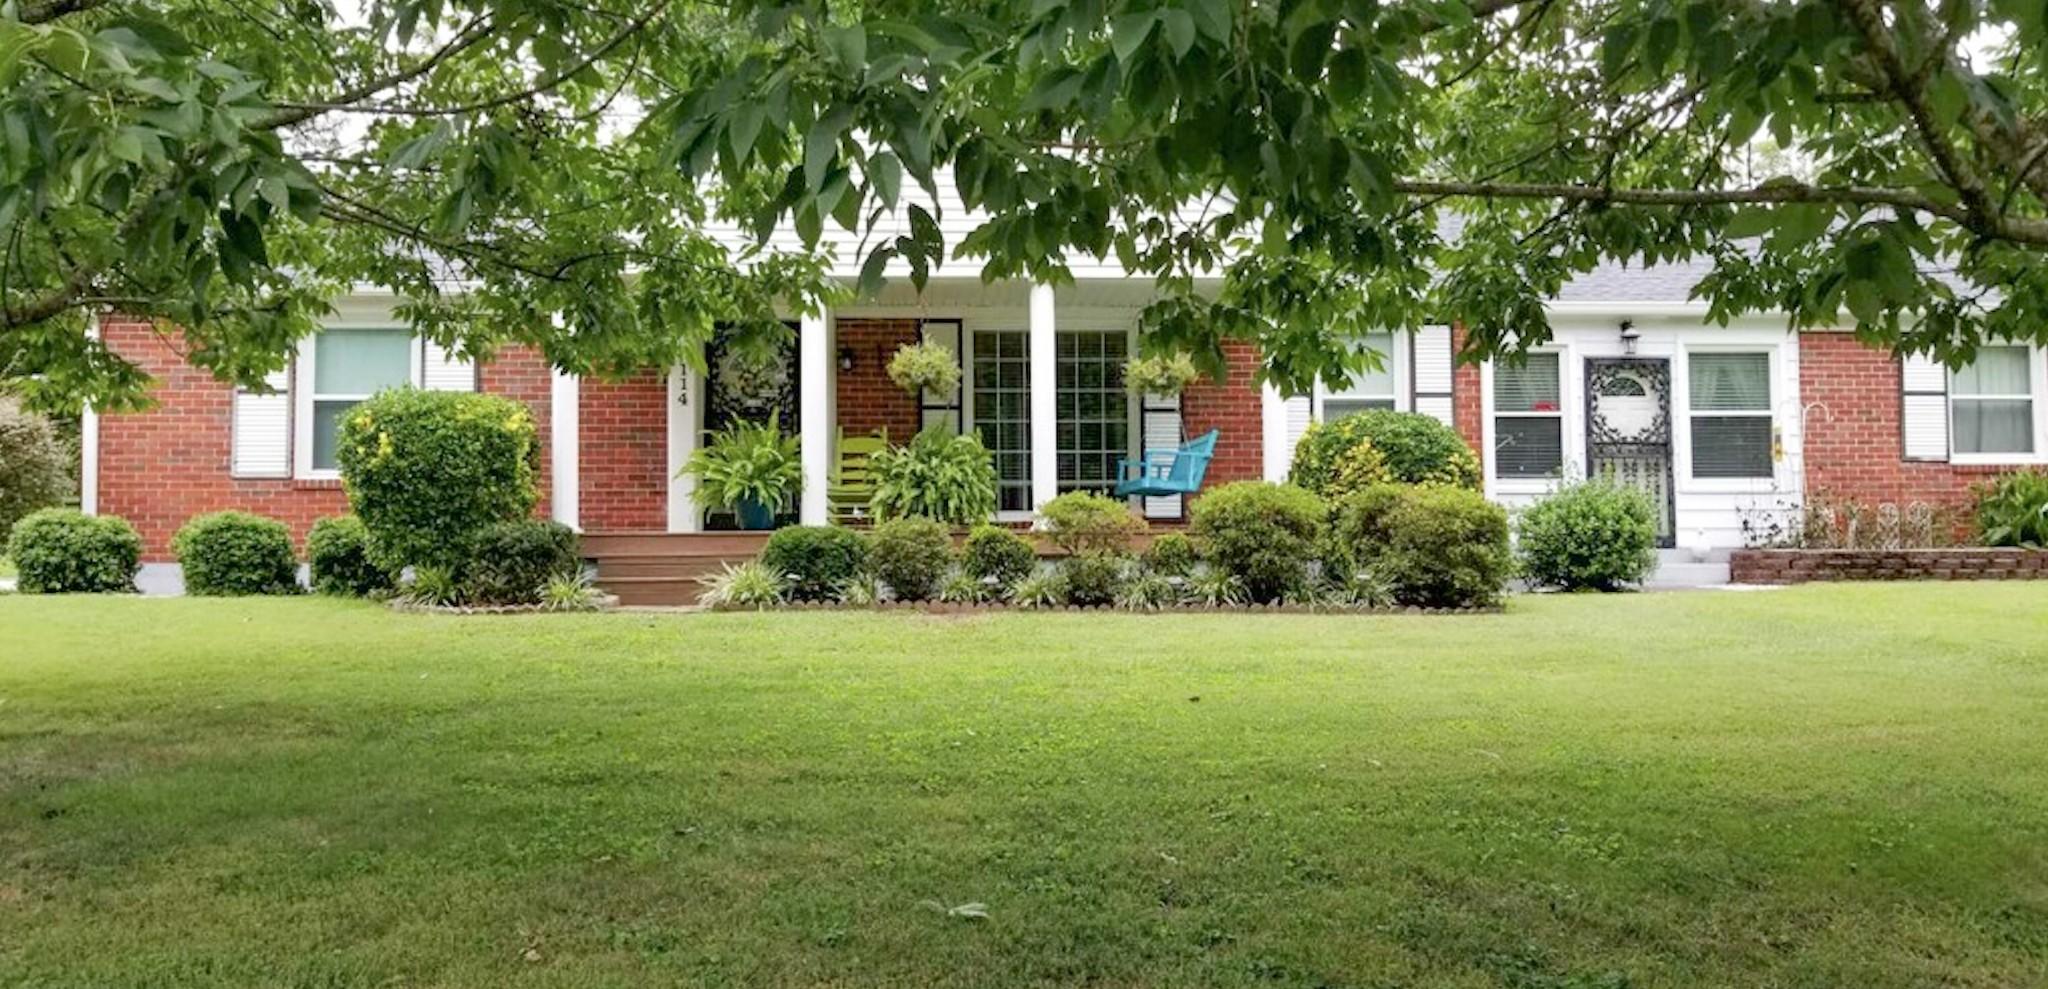 114 S Graycroft Ave, Madison, TN 37115 - Madison, TN real estate listing